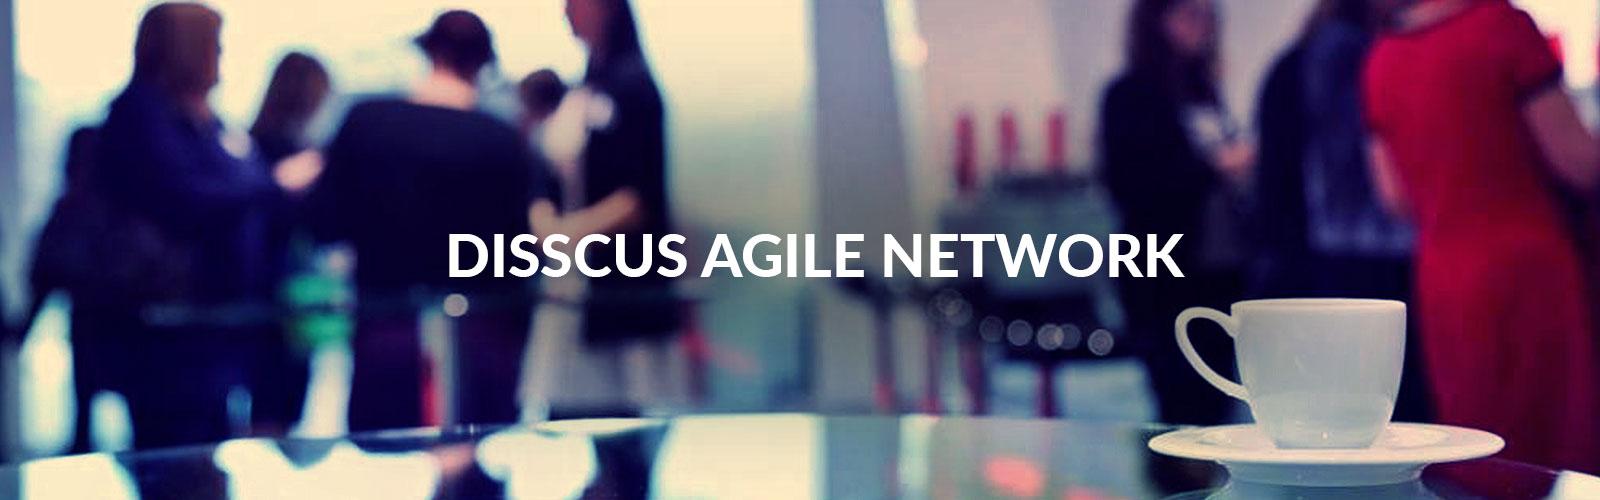 discuss-agile-conferences-banner-v3